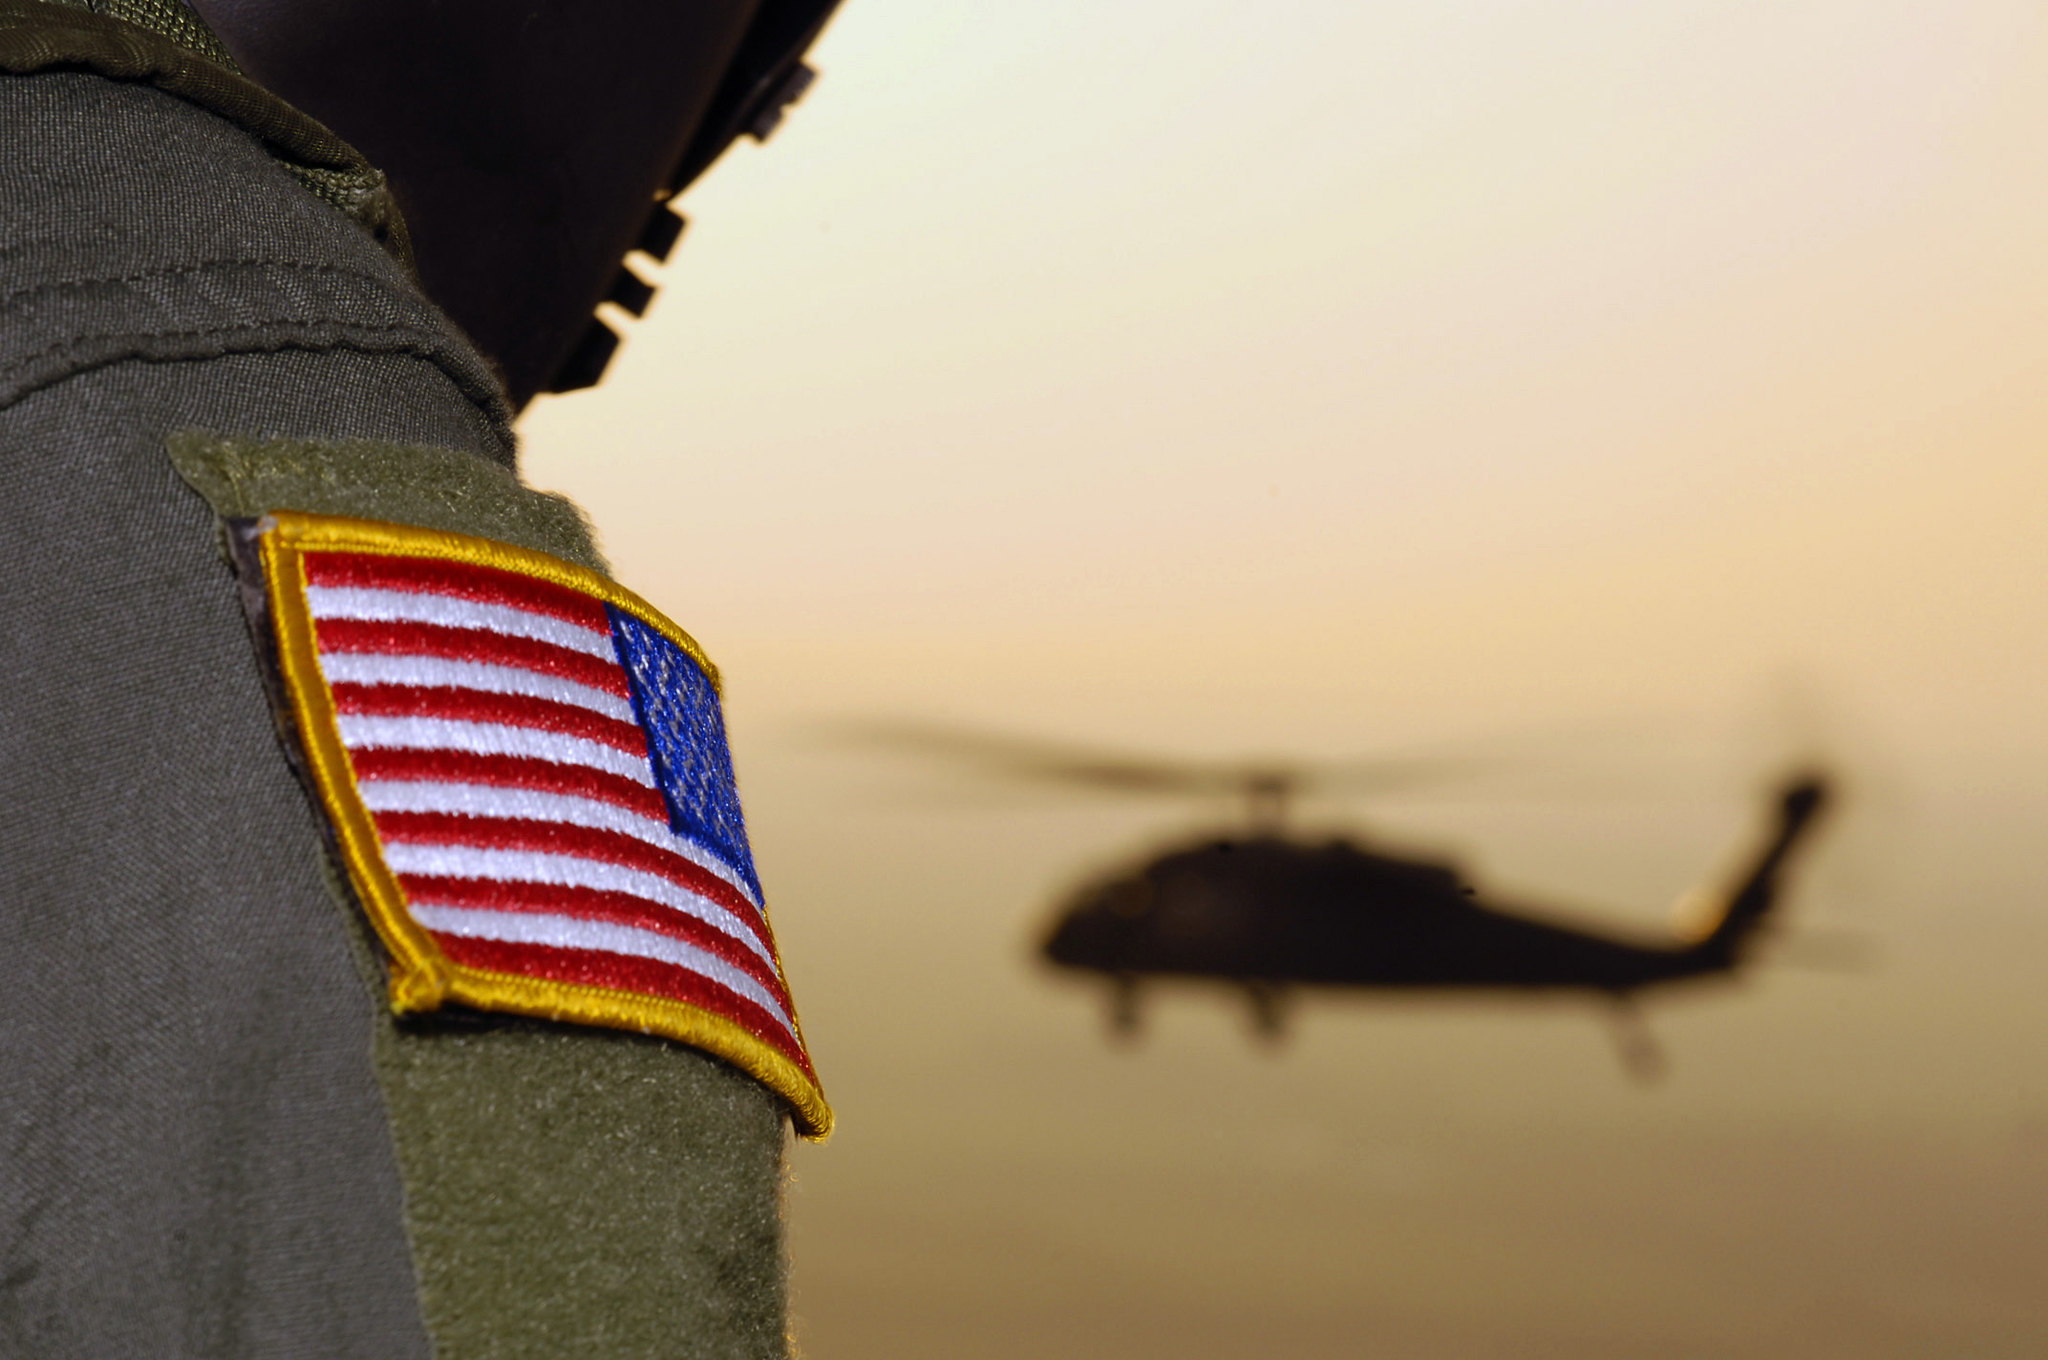 #1653: Army Working To Fix Broken Sexual Assault Prevention Program | 51%